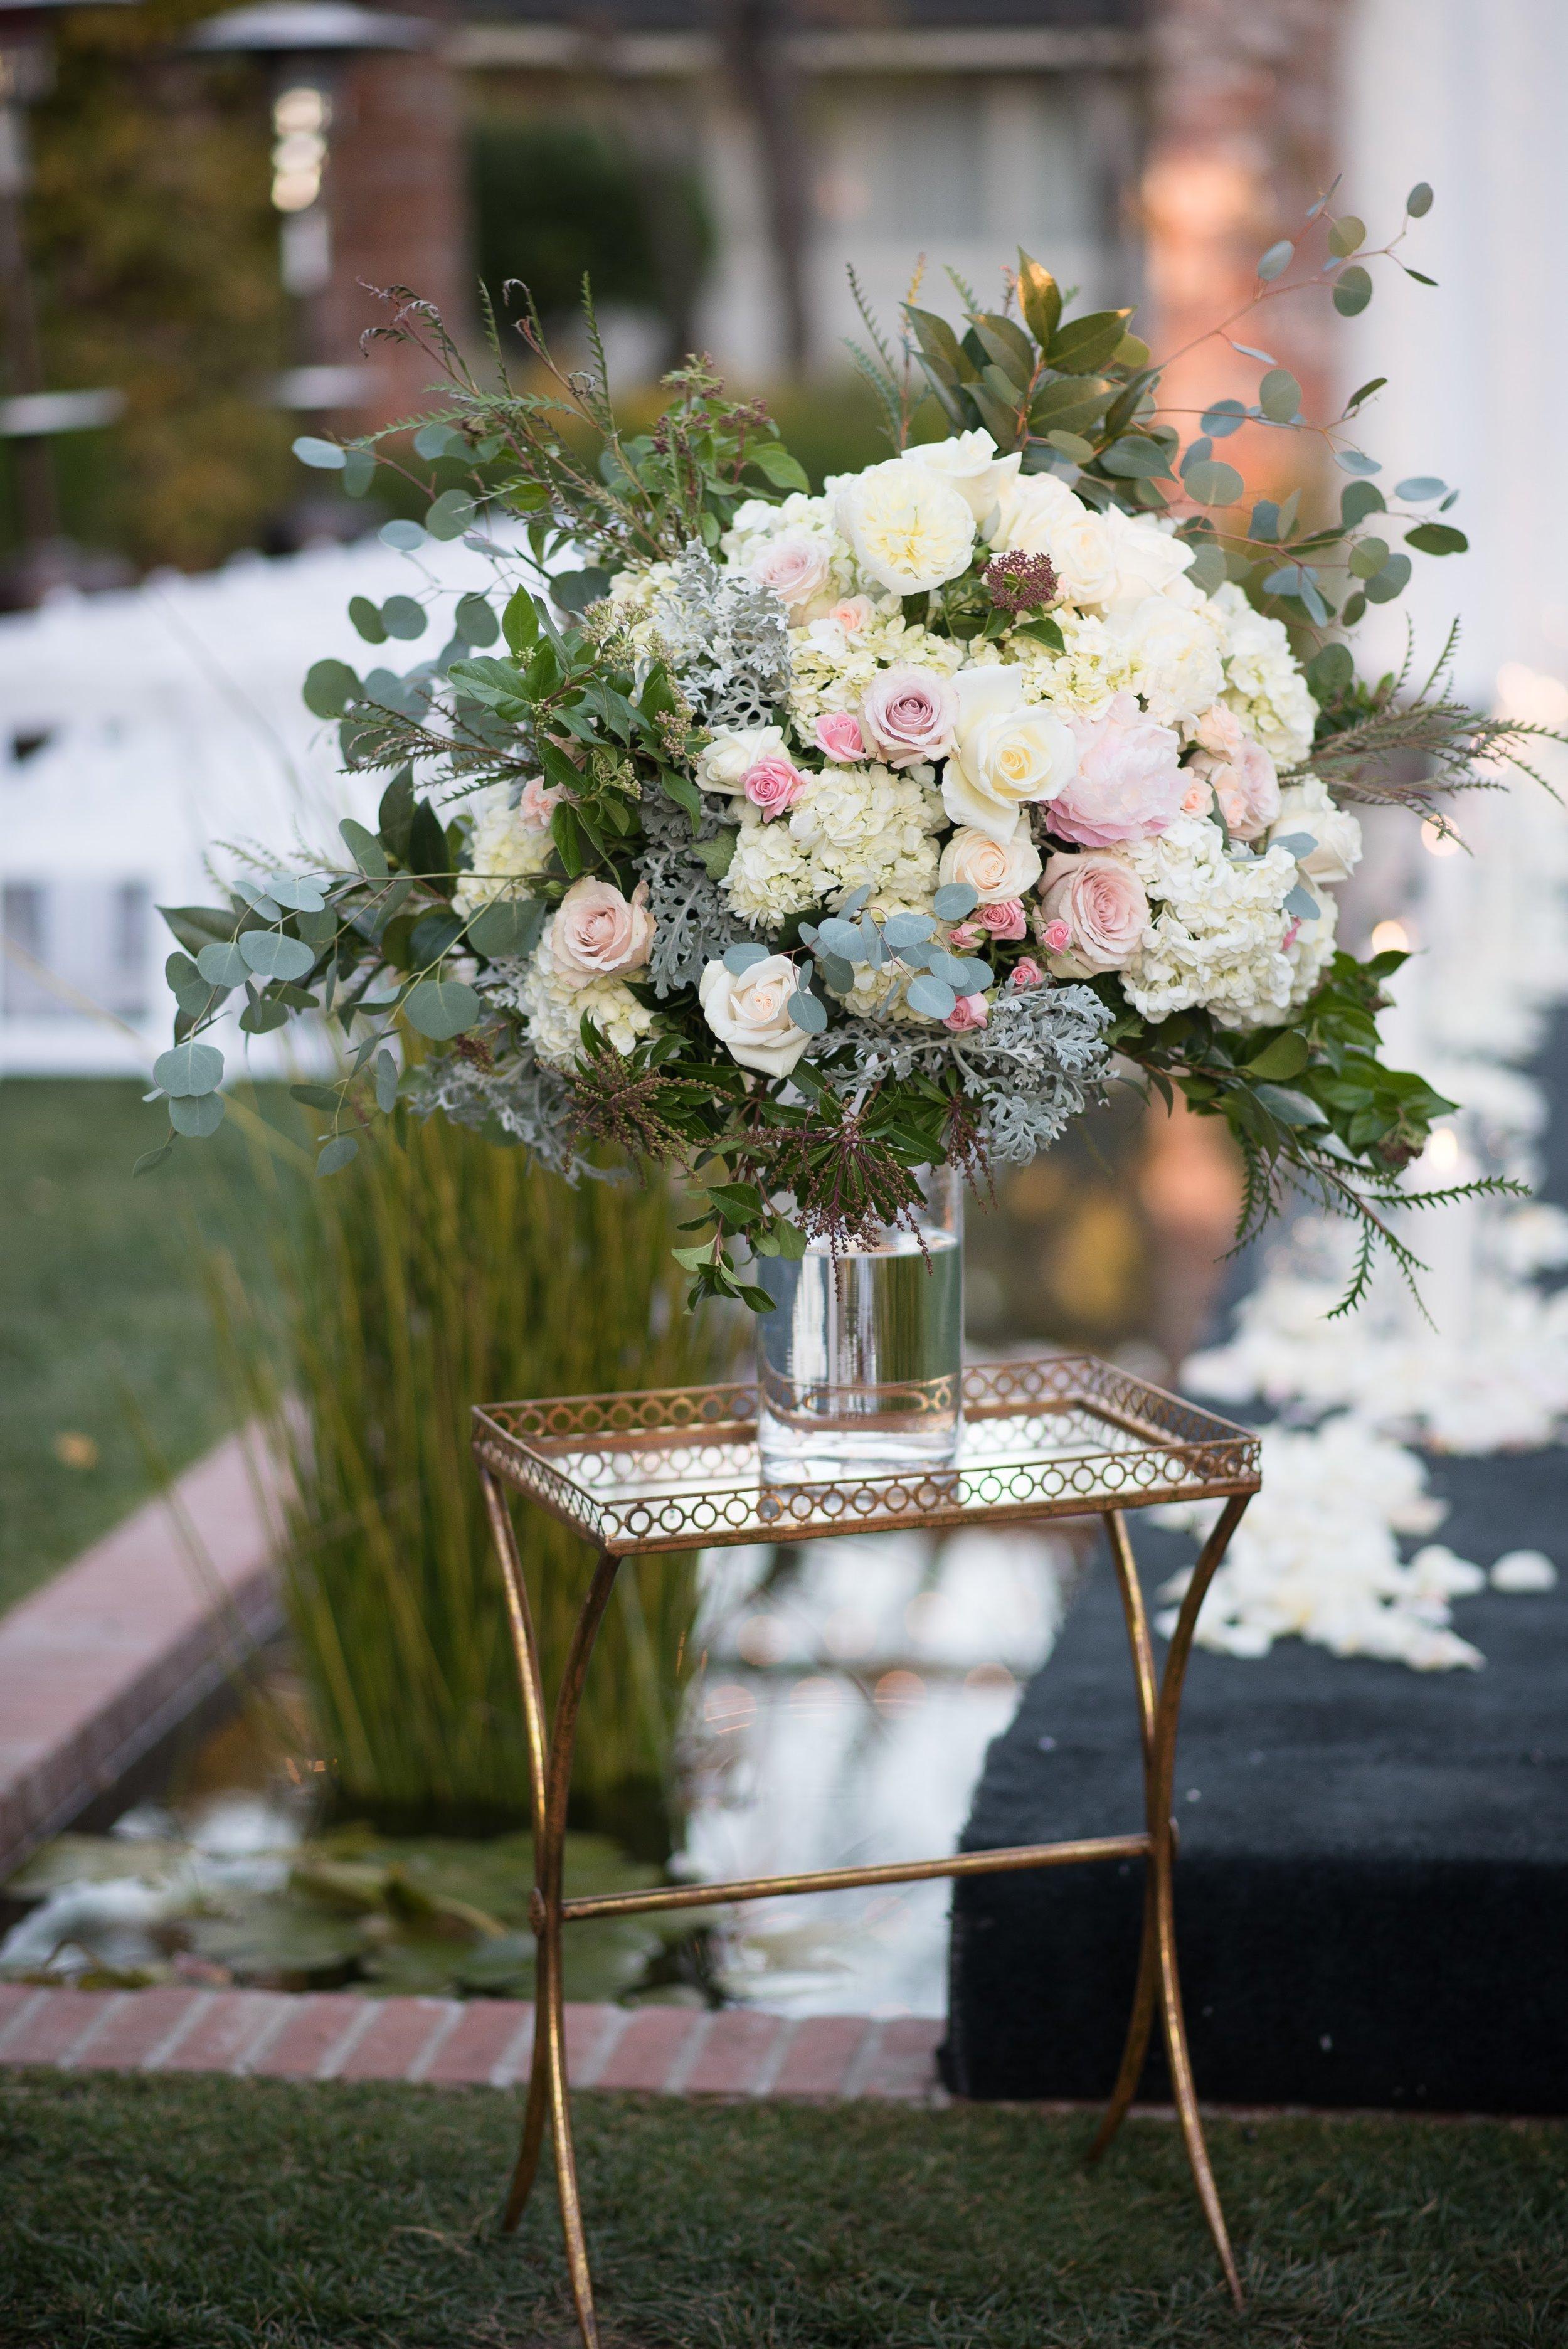 www.santabarbaraweddingstyle.com | Santa Barbara Wedding Style | Precious and Blooming | El Encanto Wedding | Nate and Jenny Weddings | Bellavista Designs | Wedding Aisle | Ceremony Alter Decor